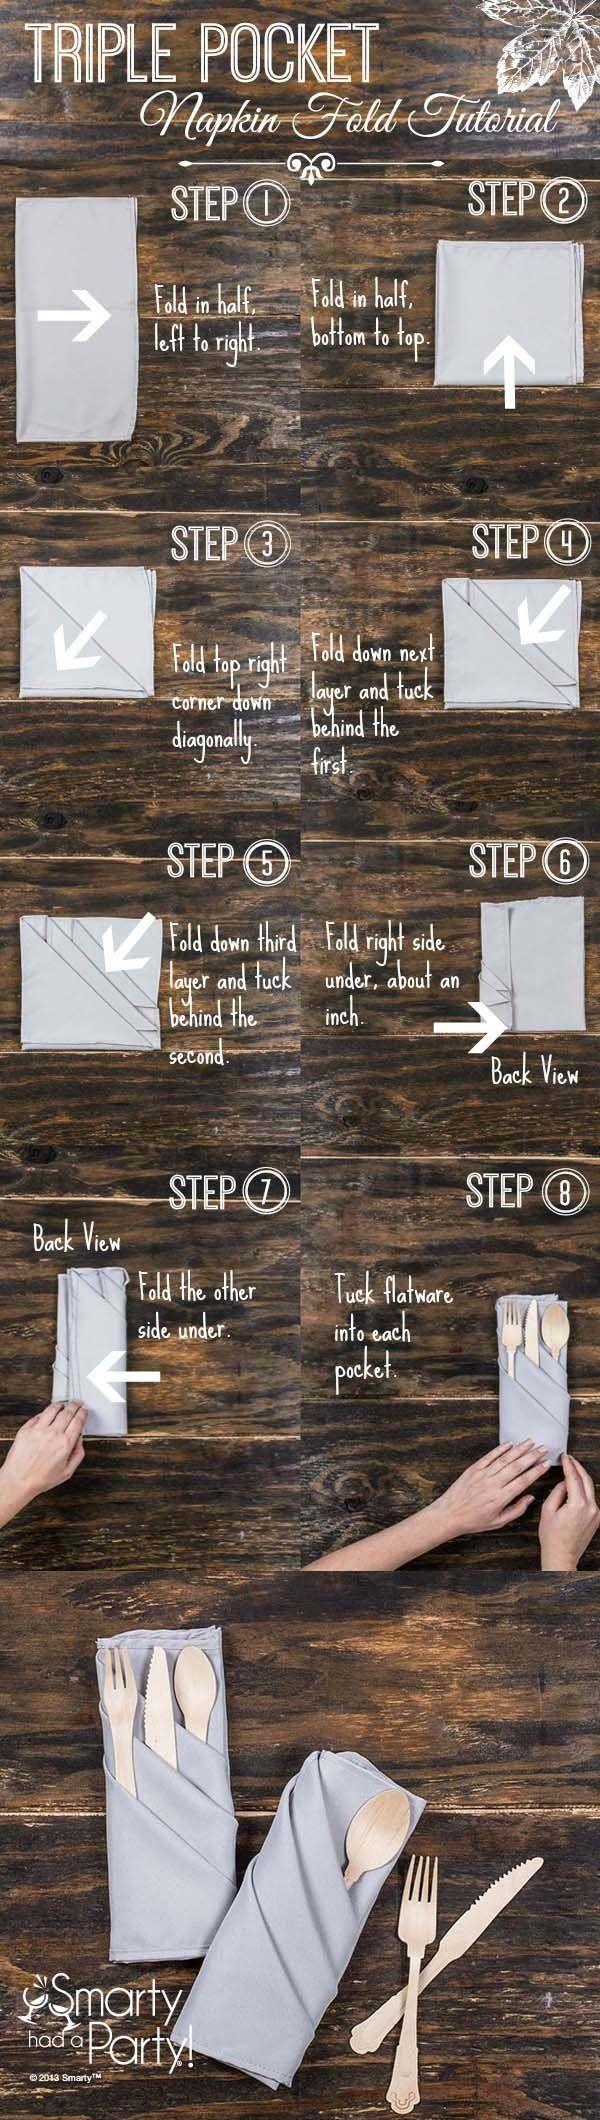 Triple Pocket Napkin Fold Tutorial#SmartyHadAParty